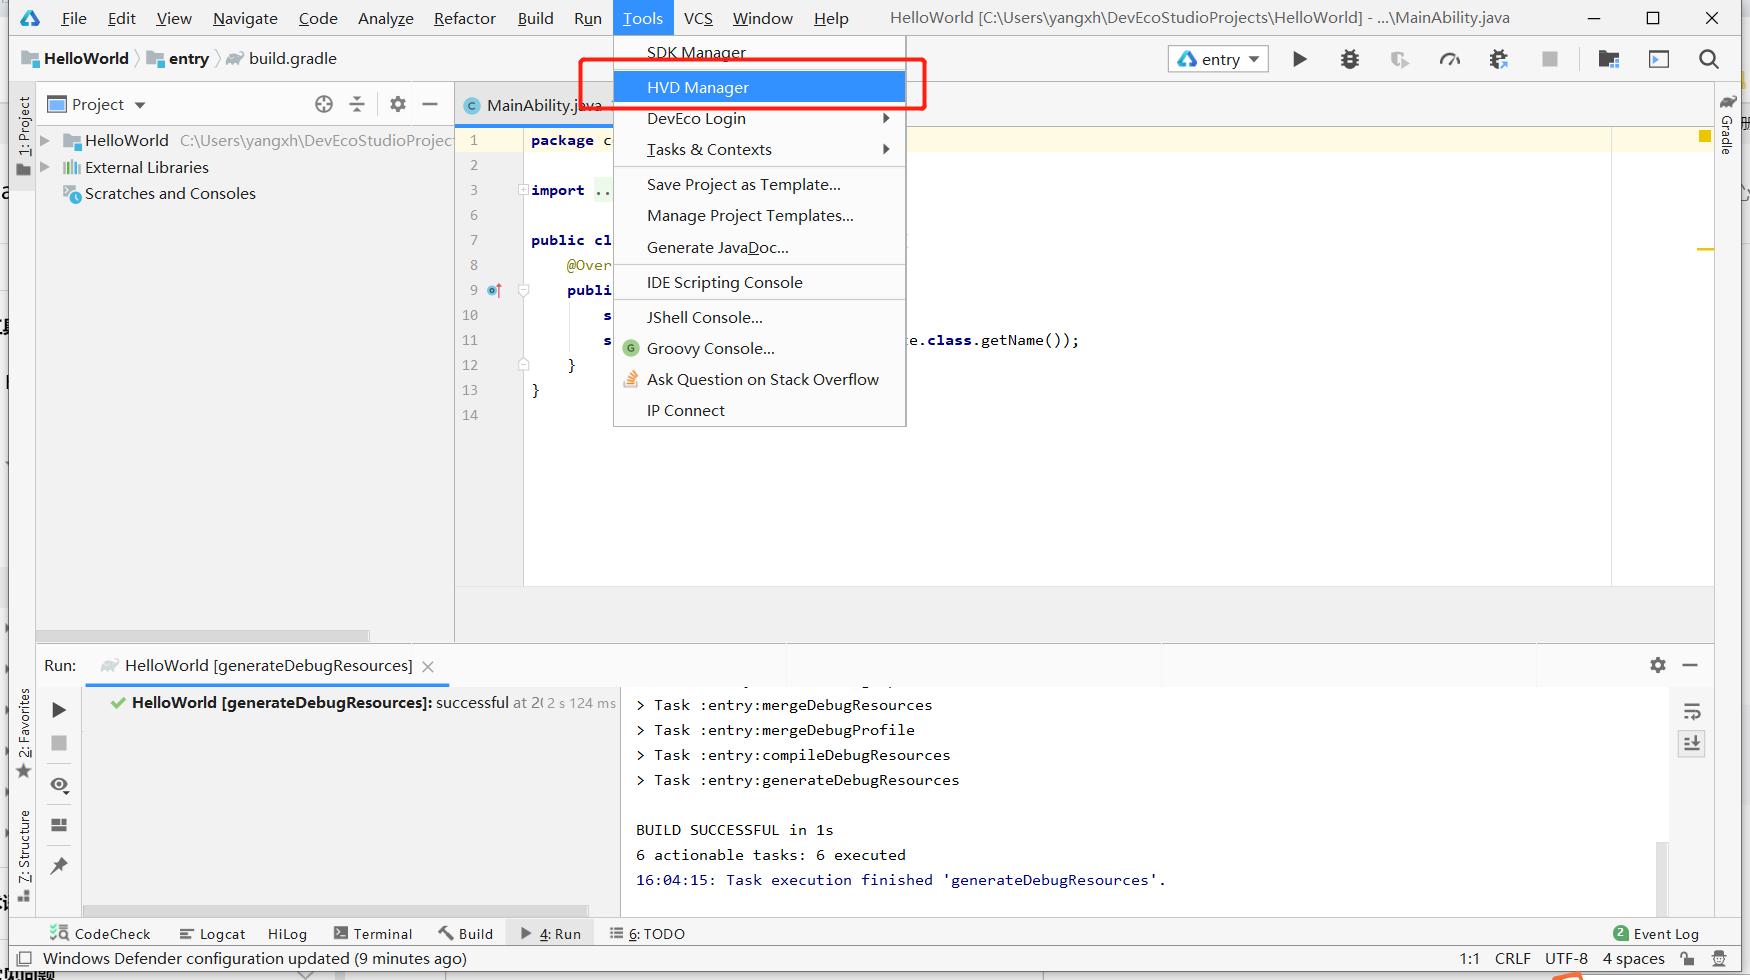 5623f154f975e0419fa6bd5227128700 - HarmonyOS(五)应用开发之创建第一个HelloWorld应用